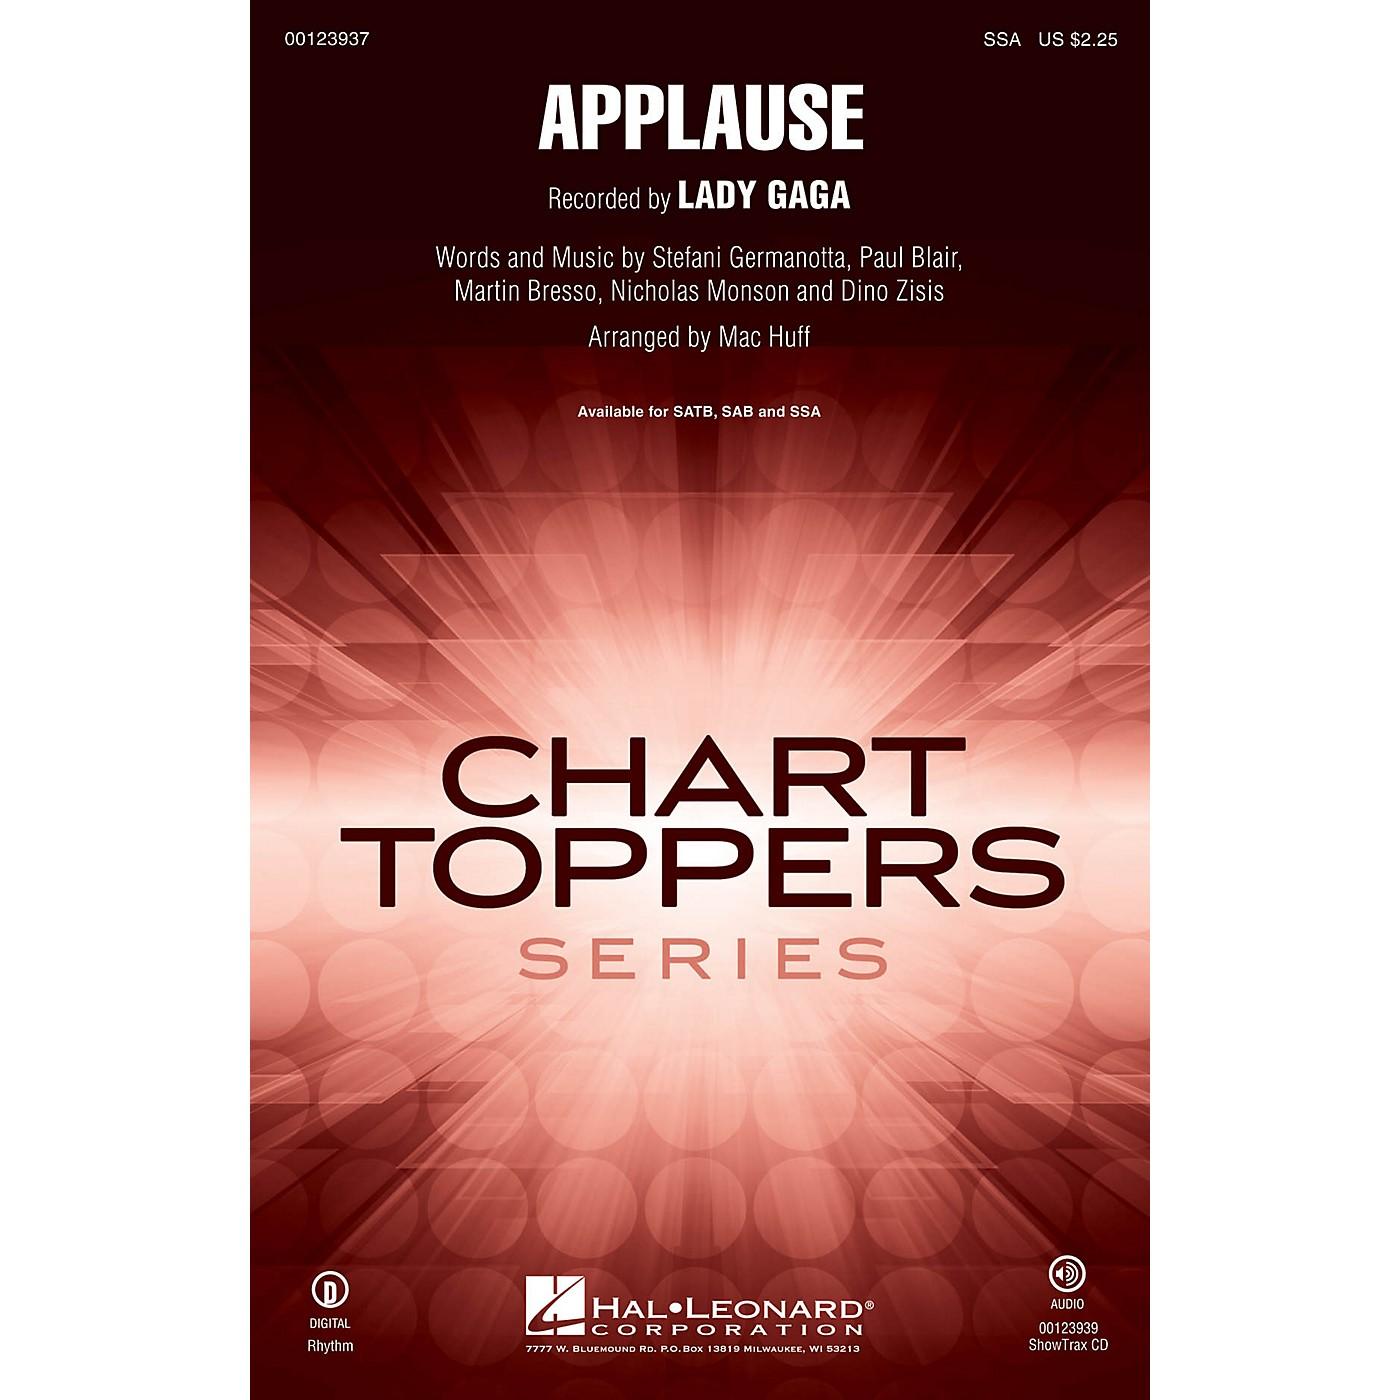 Hal Leonard Applause SSA by Lady Gaga arranged by Mac Huff thumbnail